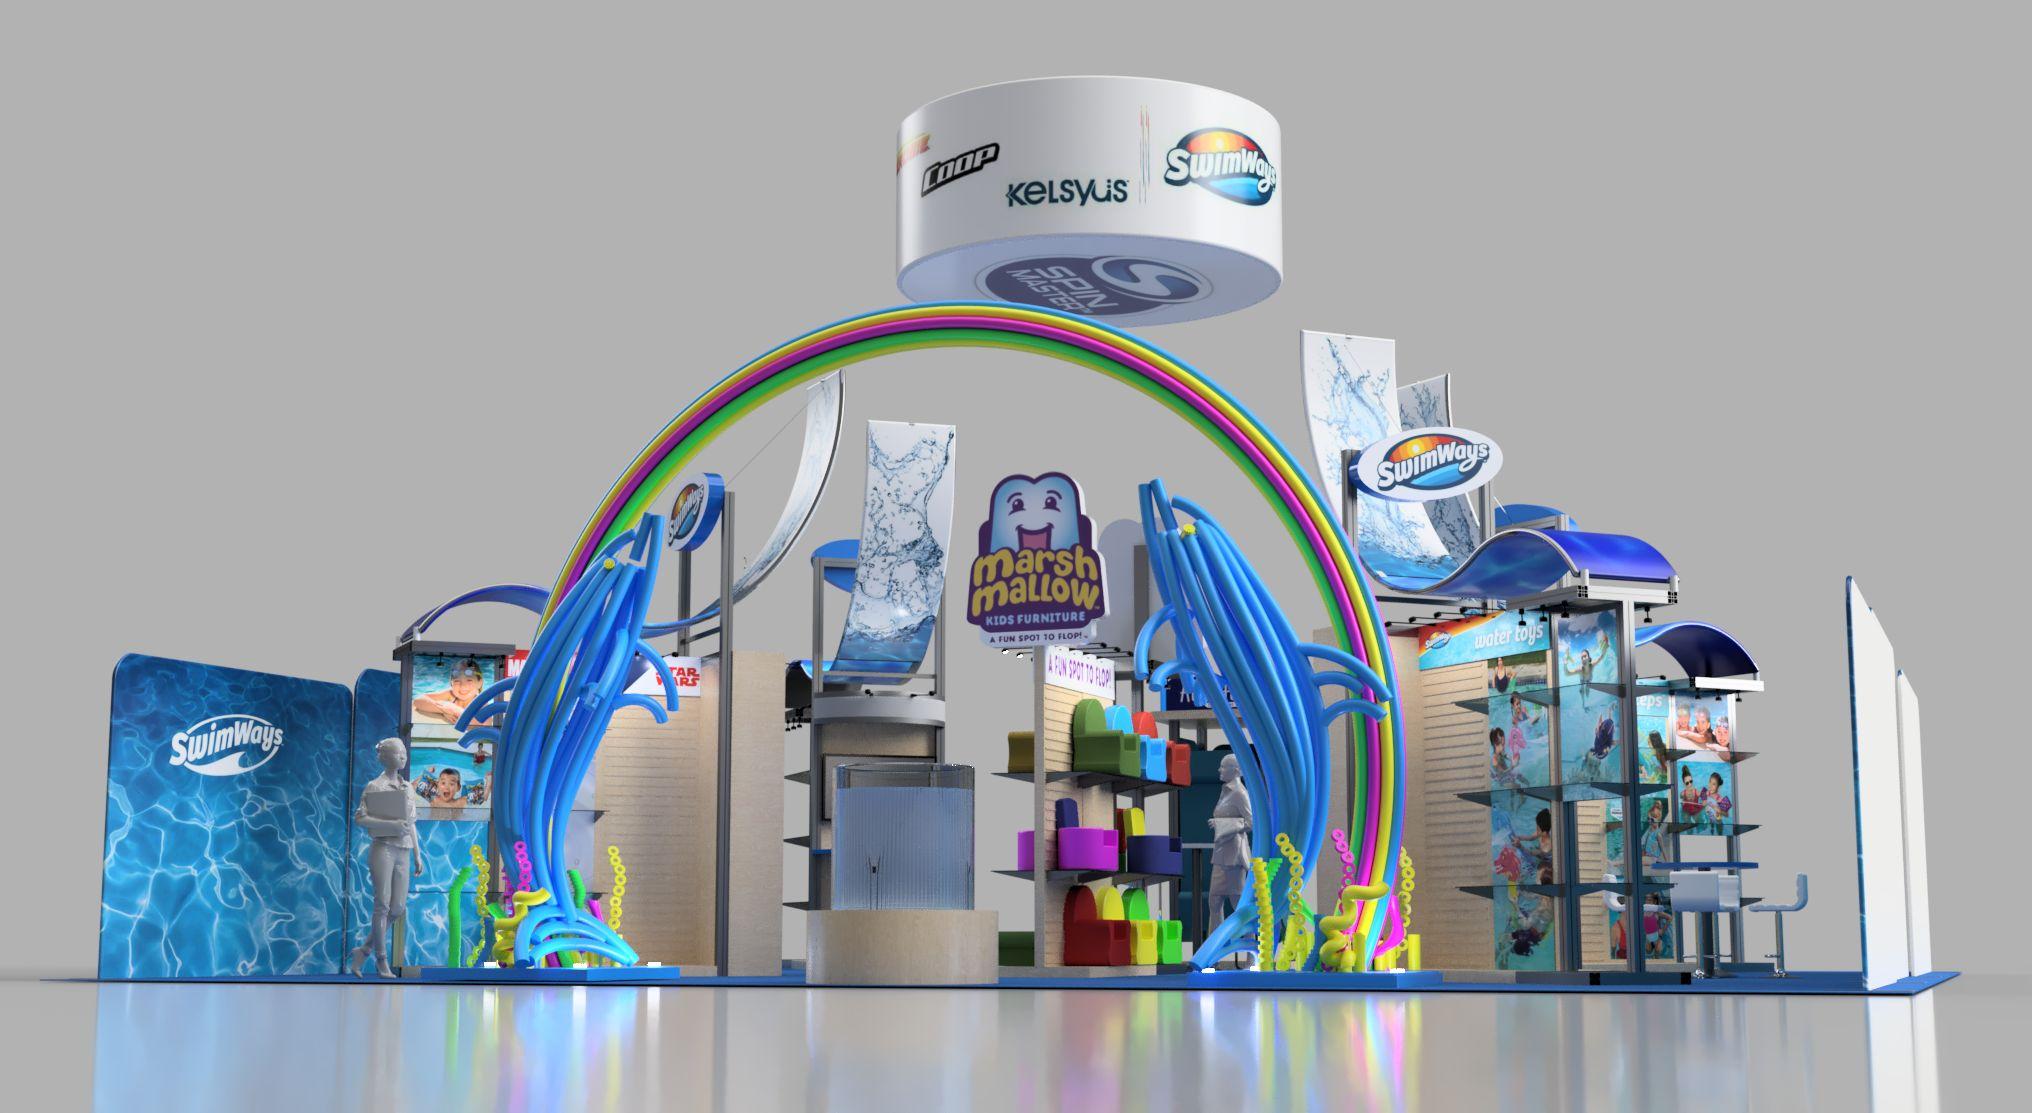 Swimways 40x50 Exhibit Booth Trade Show|Autodesk Online Gallery